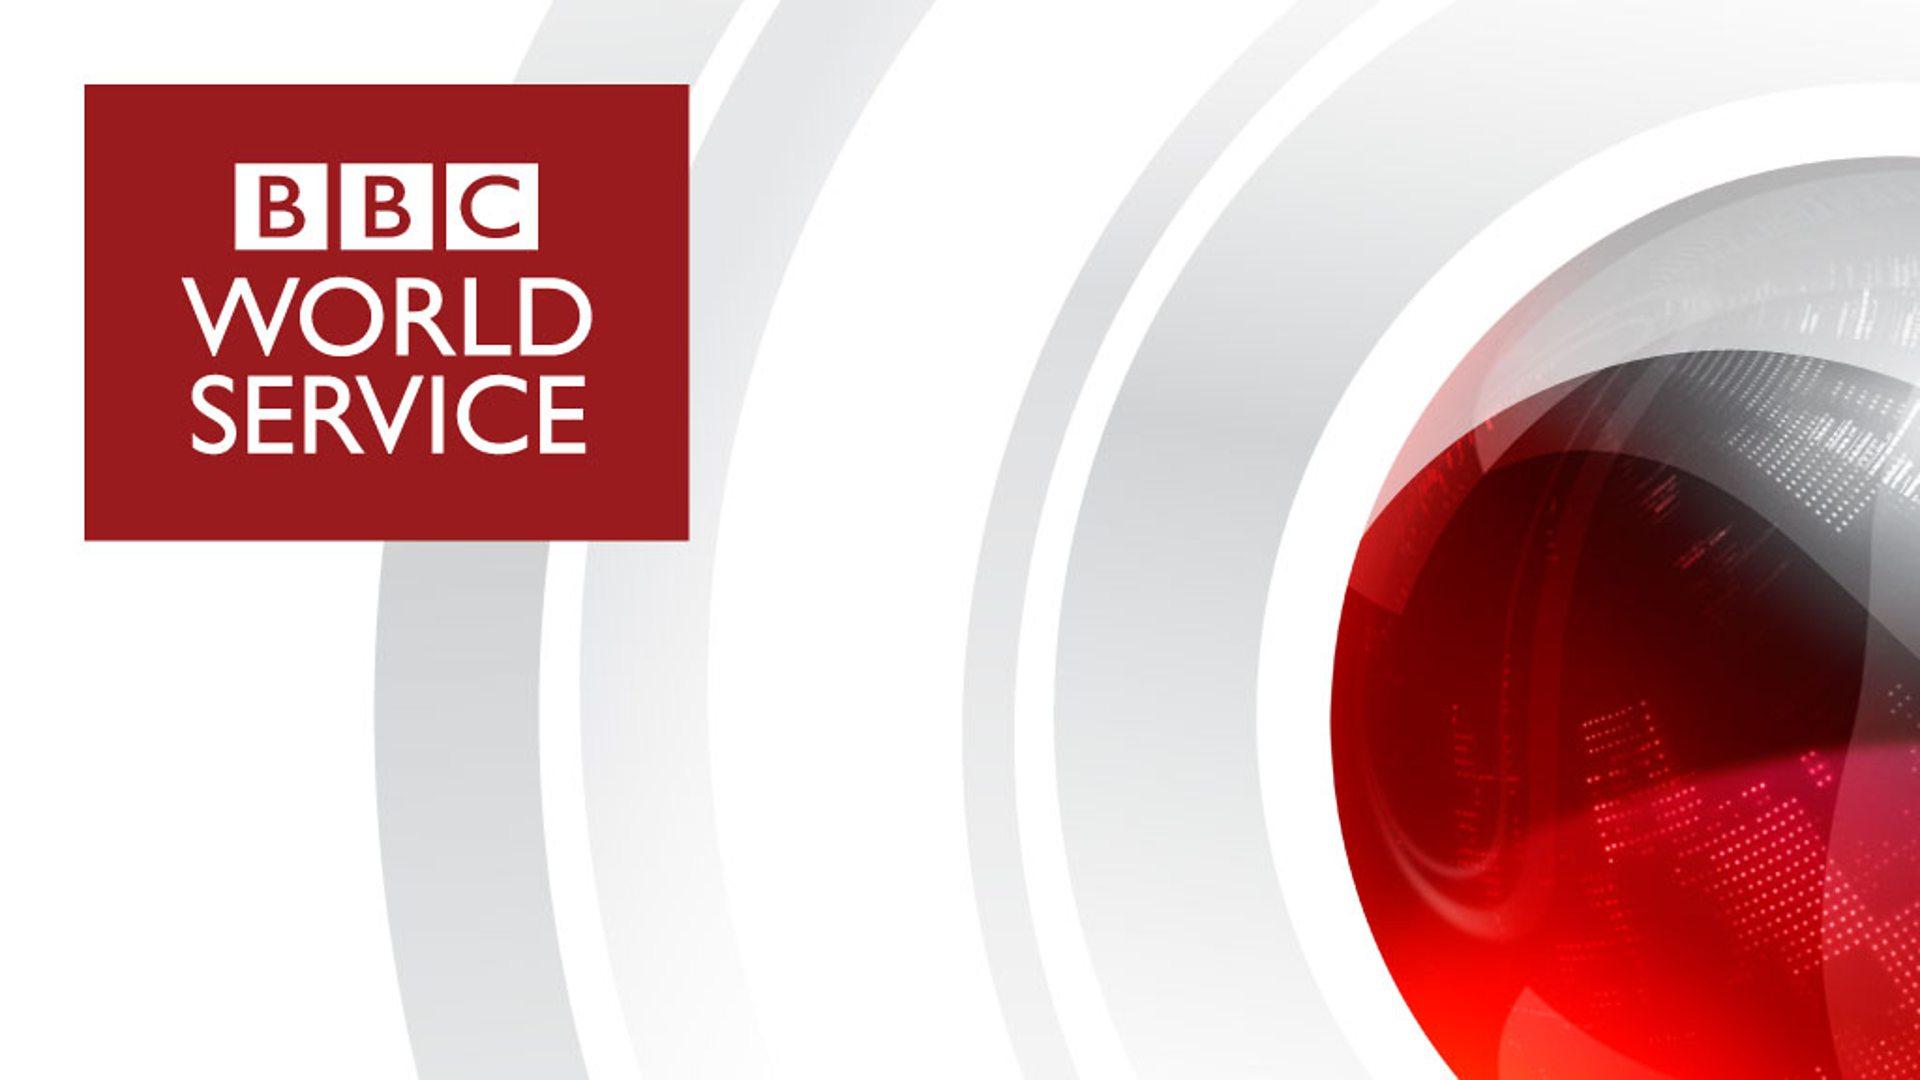 BBC World News to double US reach - Digital TV Europe